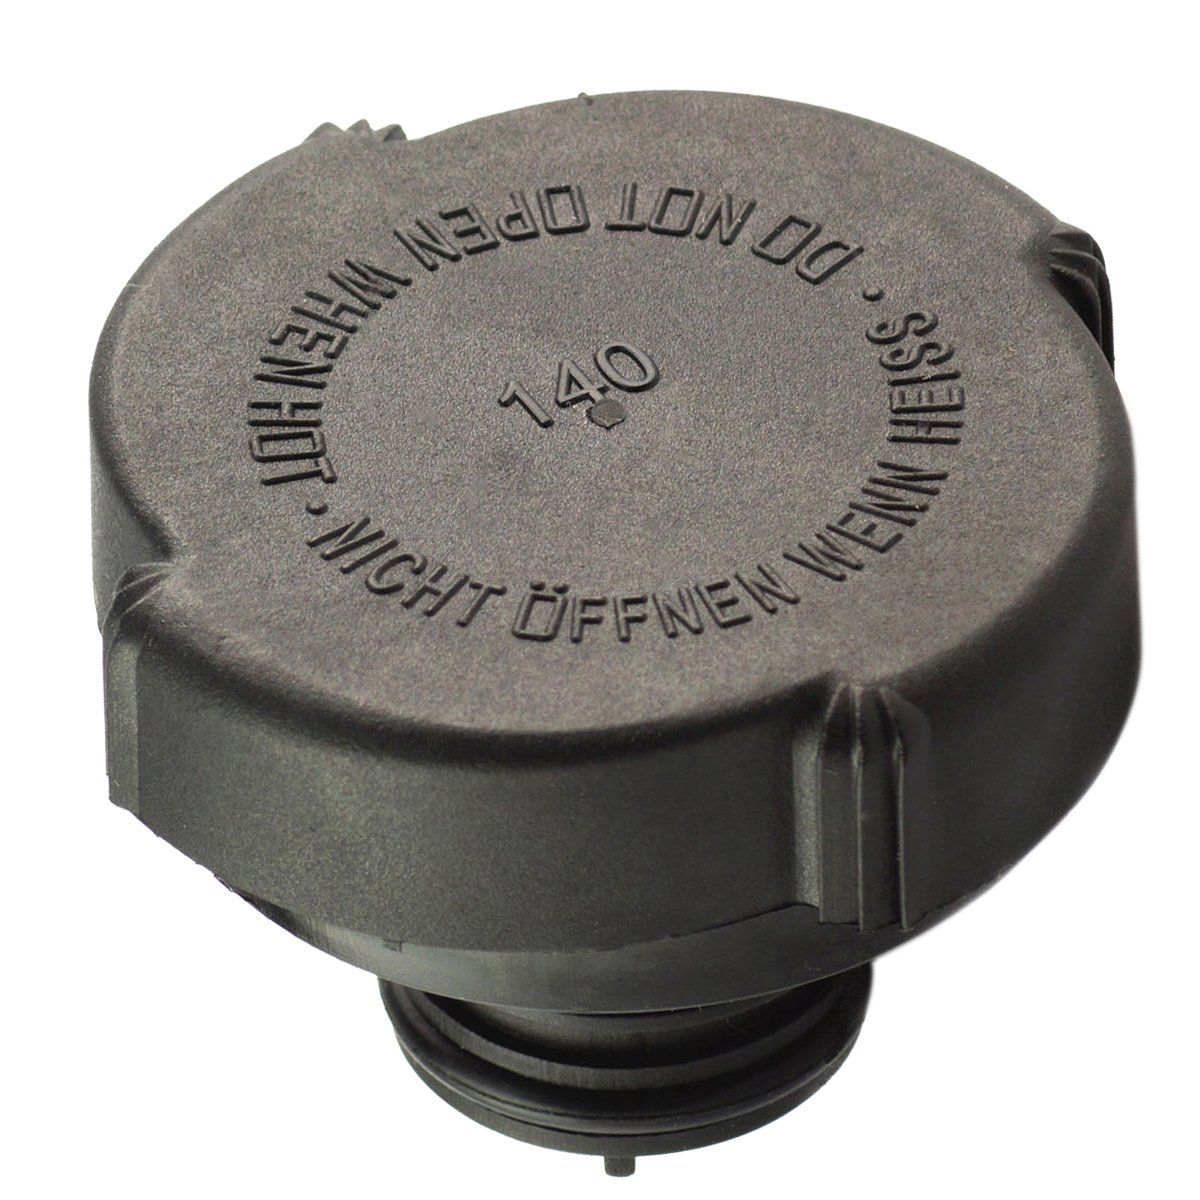 TOPAZ 17111742232 Radiator Coolant Reservoir Overflow Expansion Bottle Tank Cap for BMW E30 E36 E34 E46 E38 E39 E53 E83